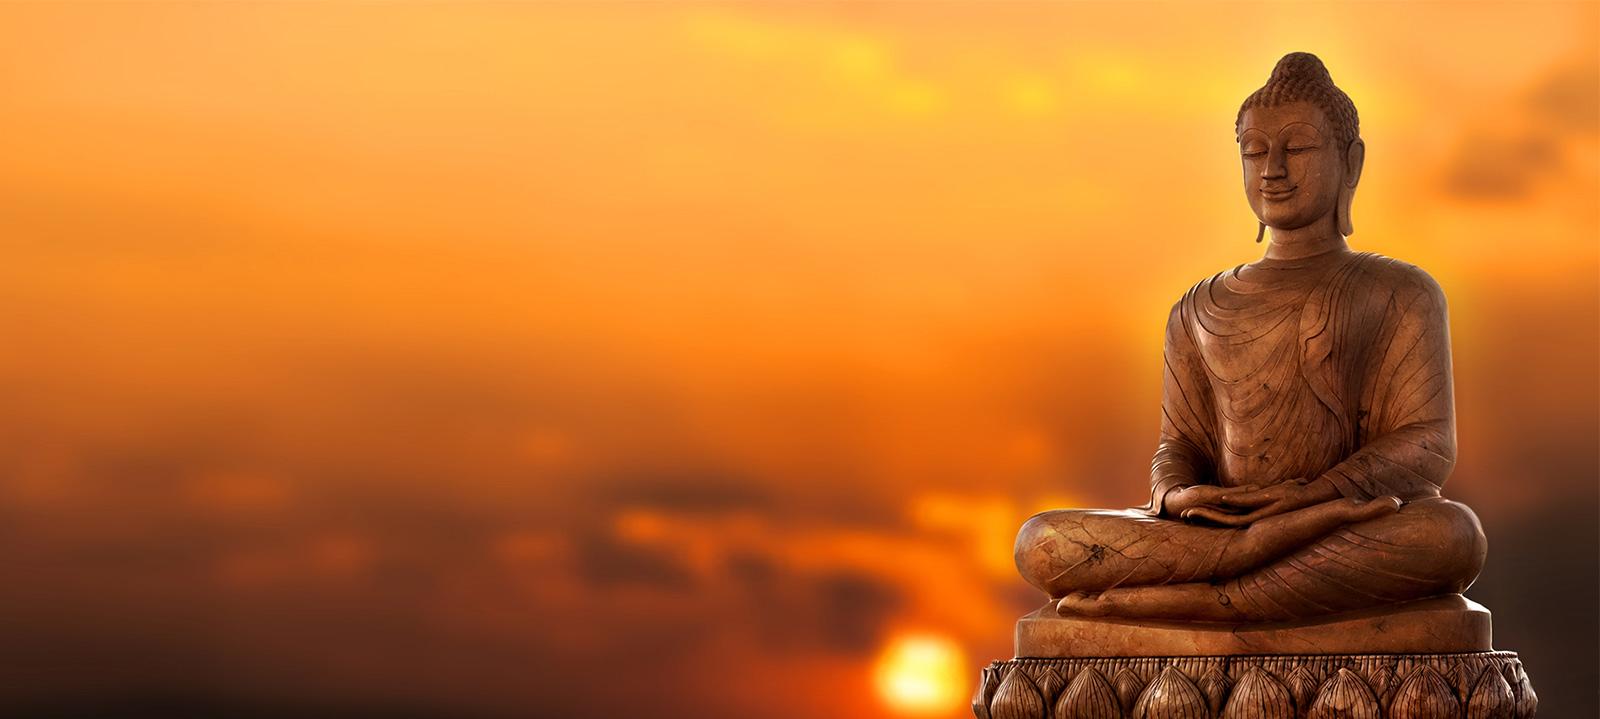 How do Buddhists practice mindfulness meditation? 1